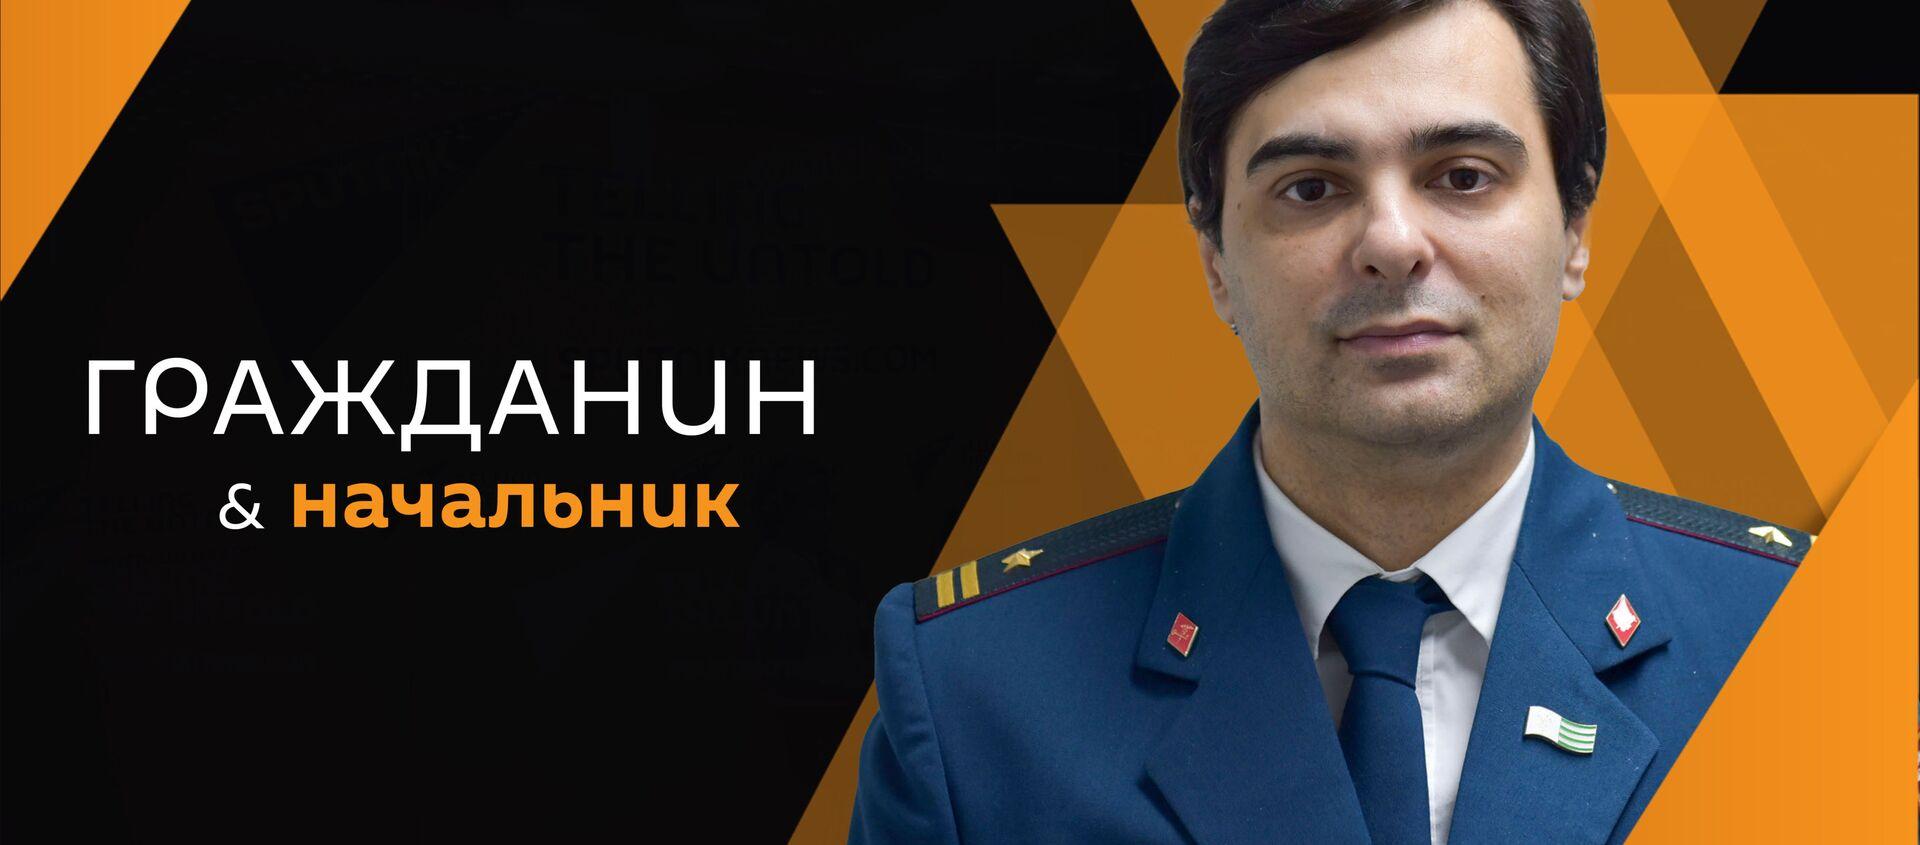 Артур Саманба - Sputnik Абхазия, 1920, 14.04.2021